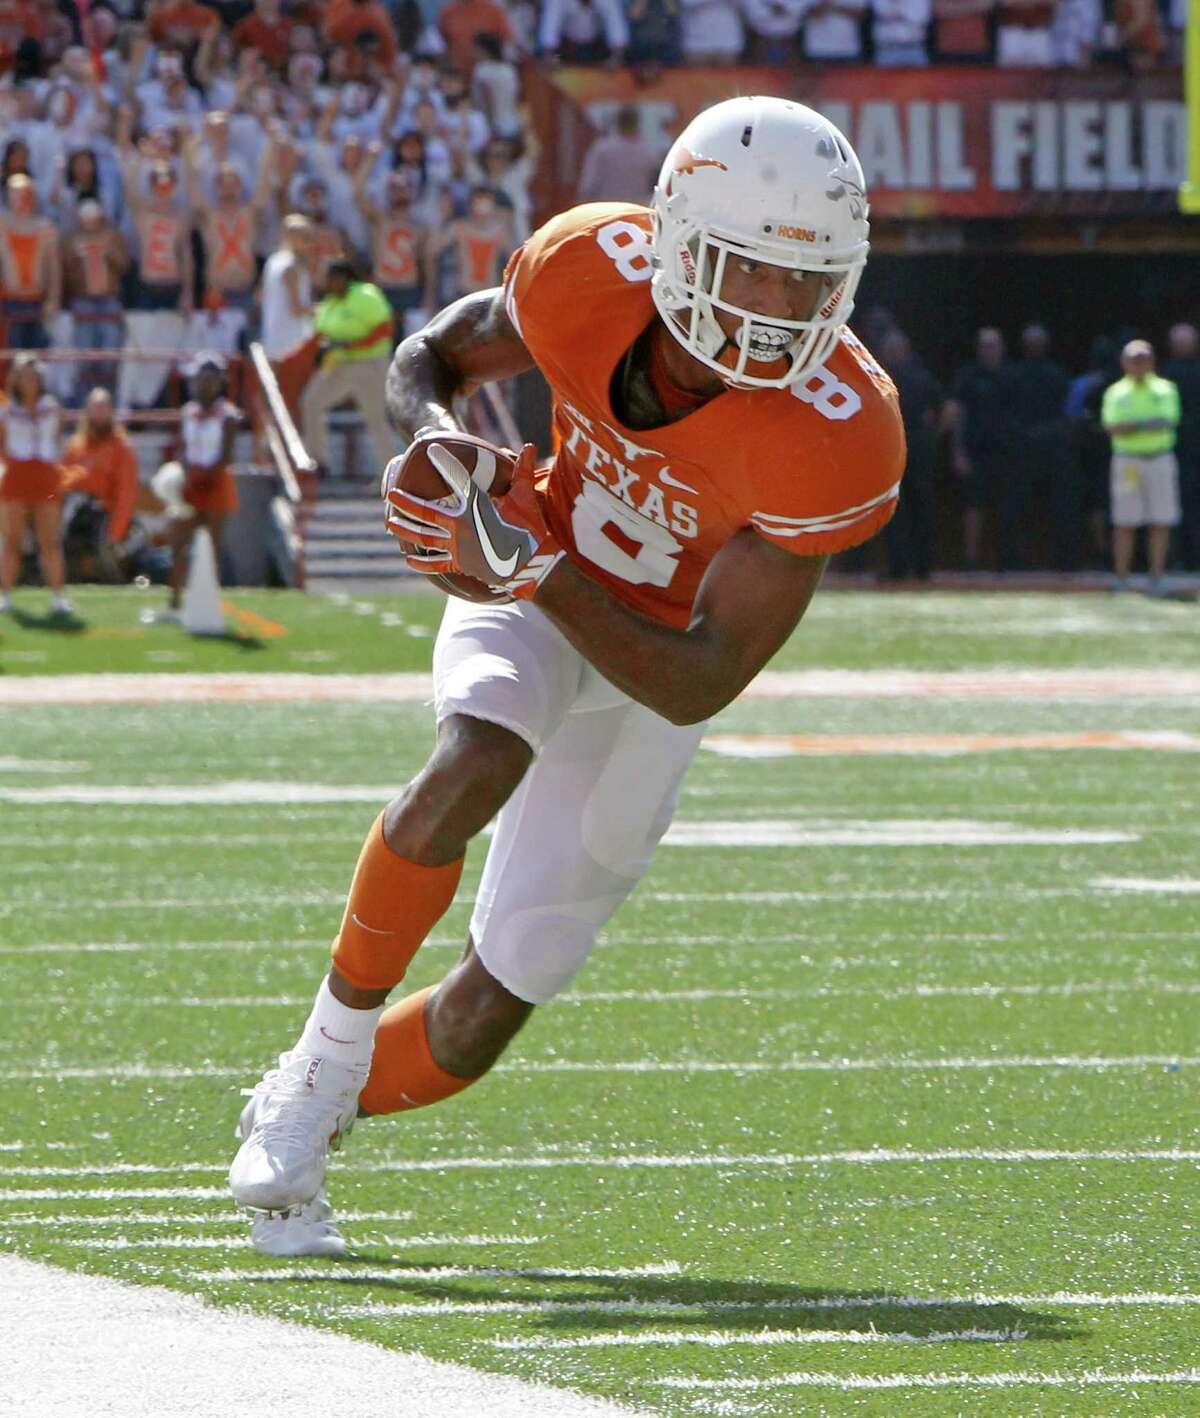 Texas receiver Dorian Leonard runs with a pass during the first half of an NCAA college football game against West Virginia, Saturday, Nov. 12, 2016, in Austin, Texas. (AP Photo/Michael Thomas)